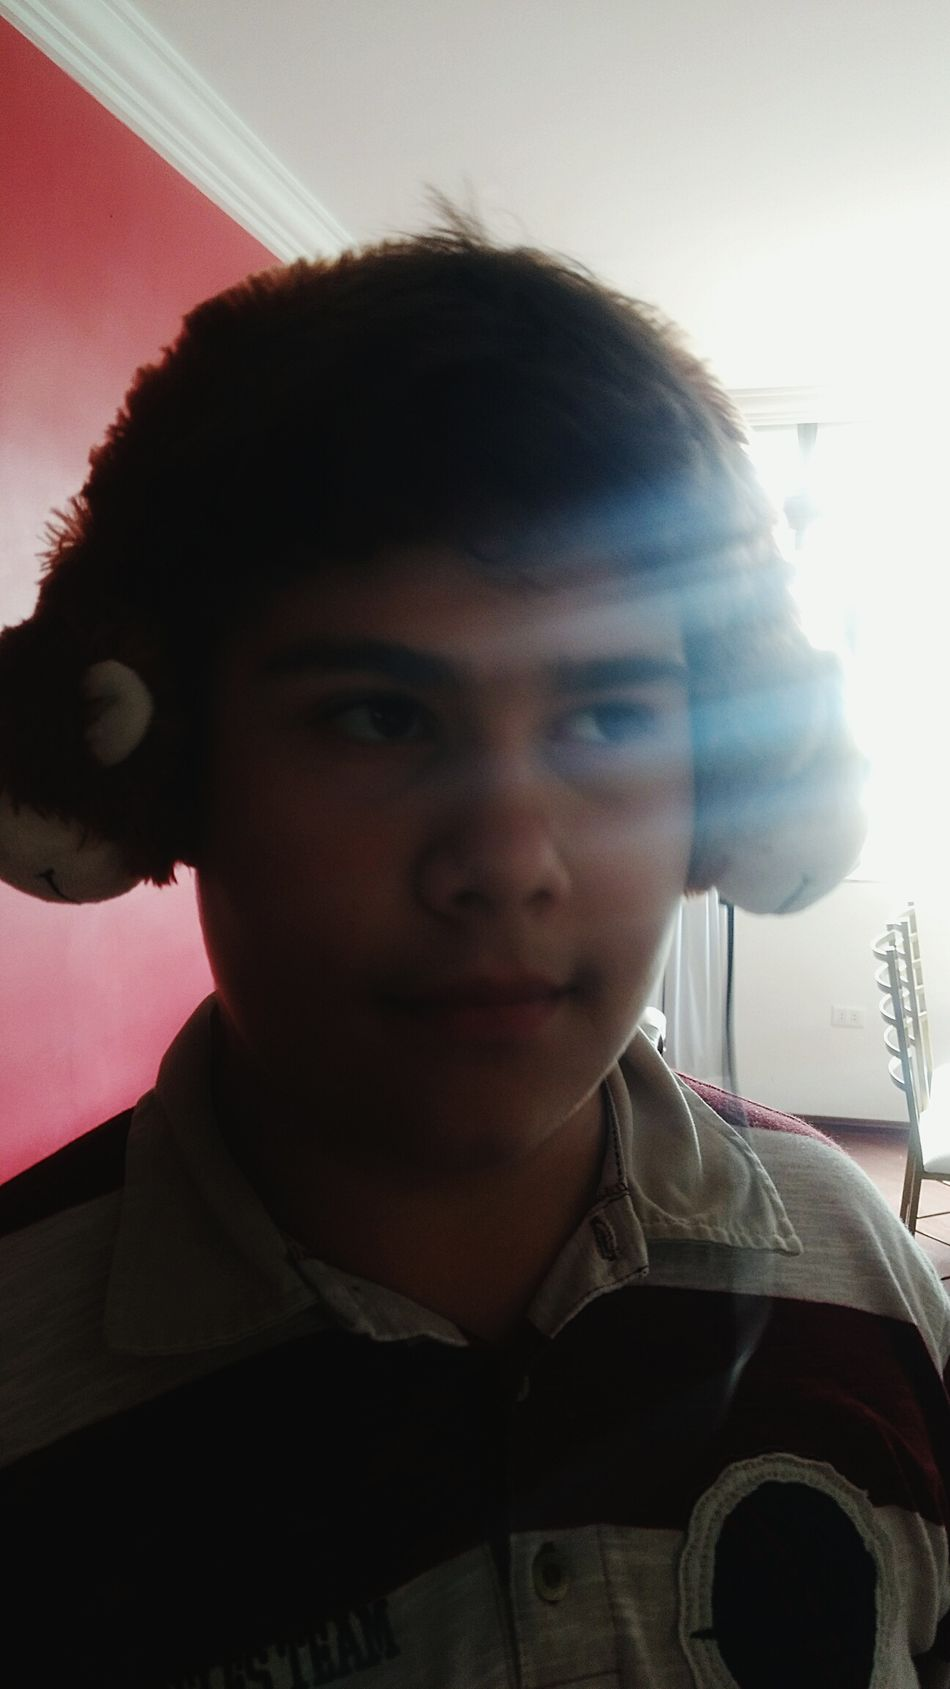 Young Cousin Jv Curitiba Batel Headphone Music